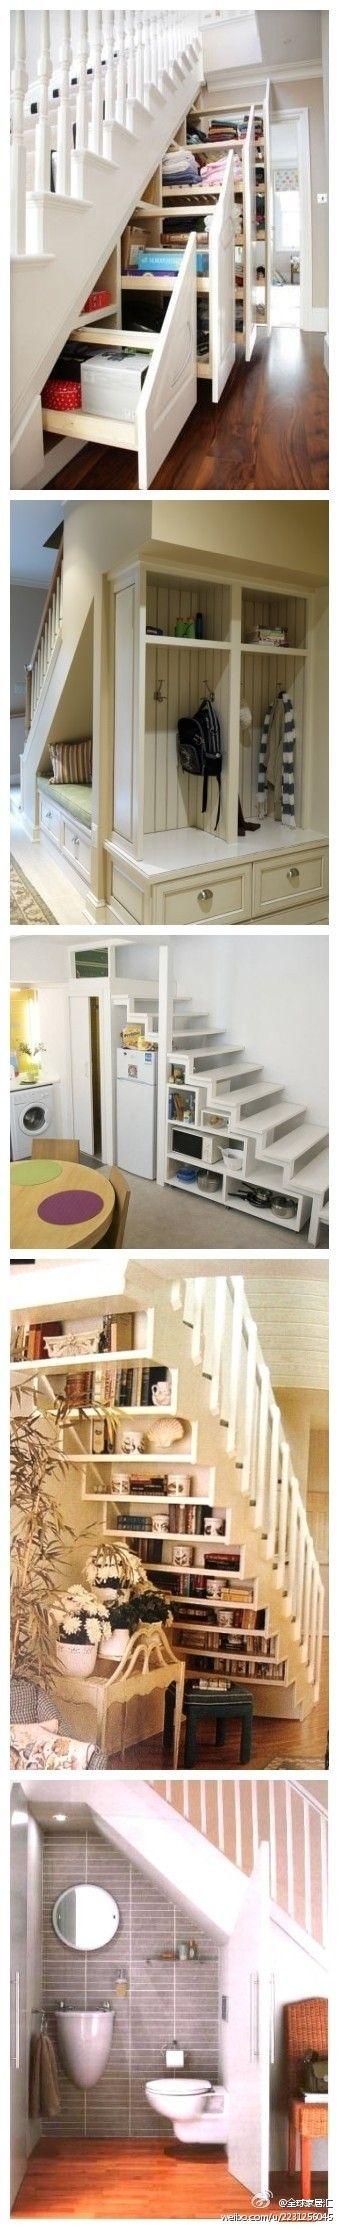 Merdiven altı değerlendirme dekore fikirleri